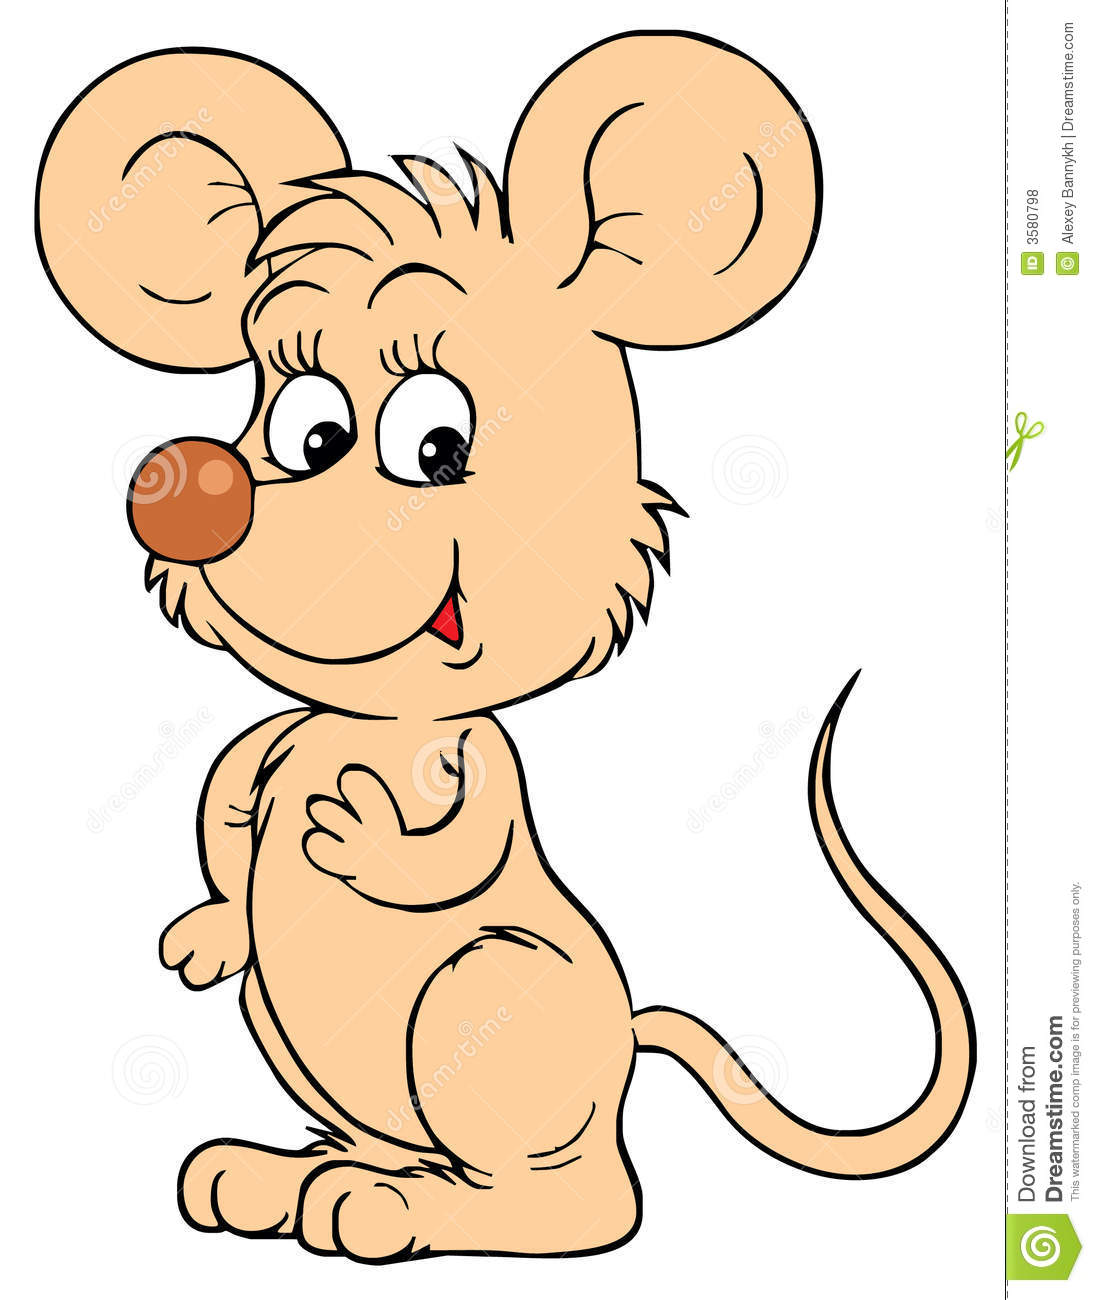 Mouse pictures clip art.